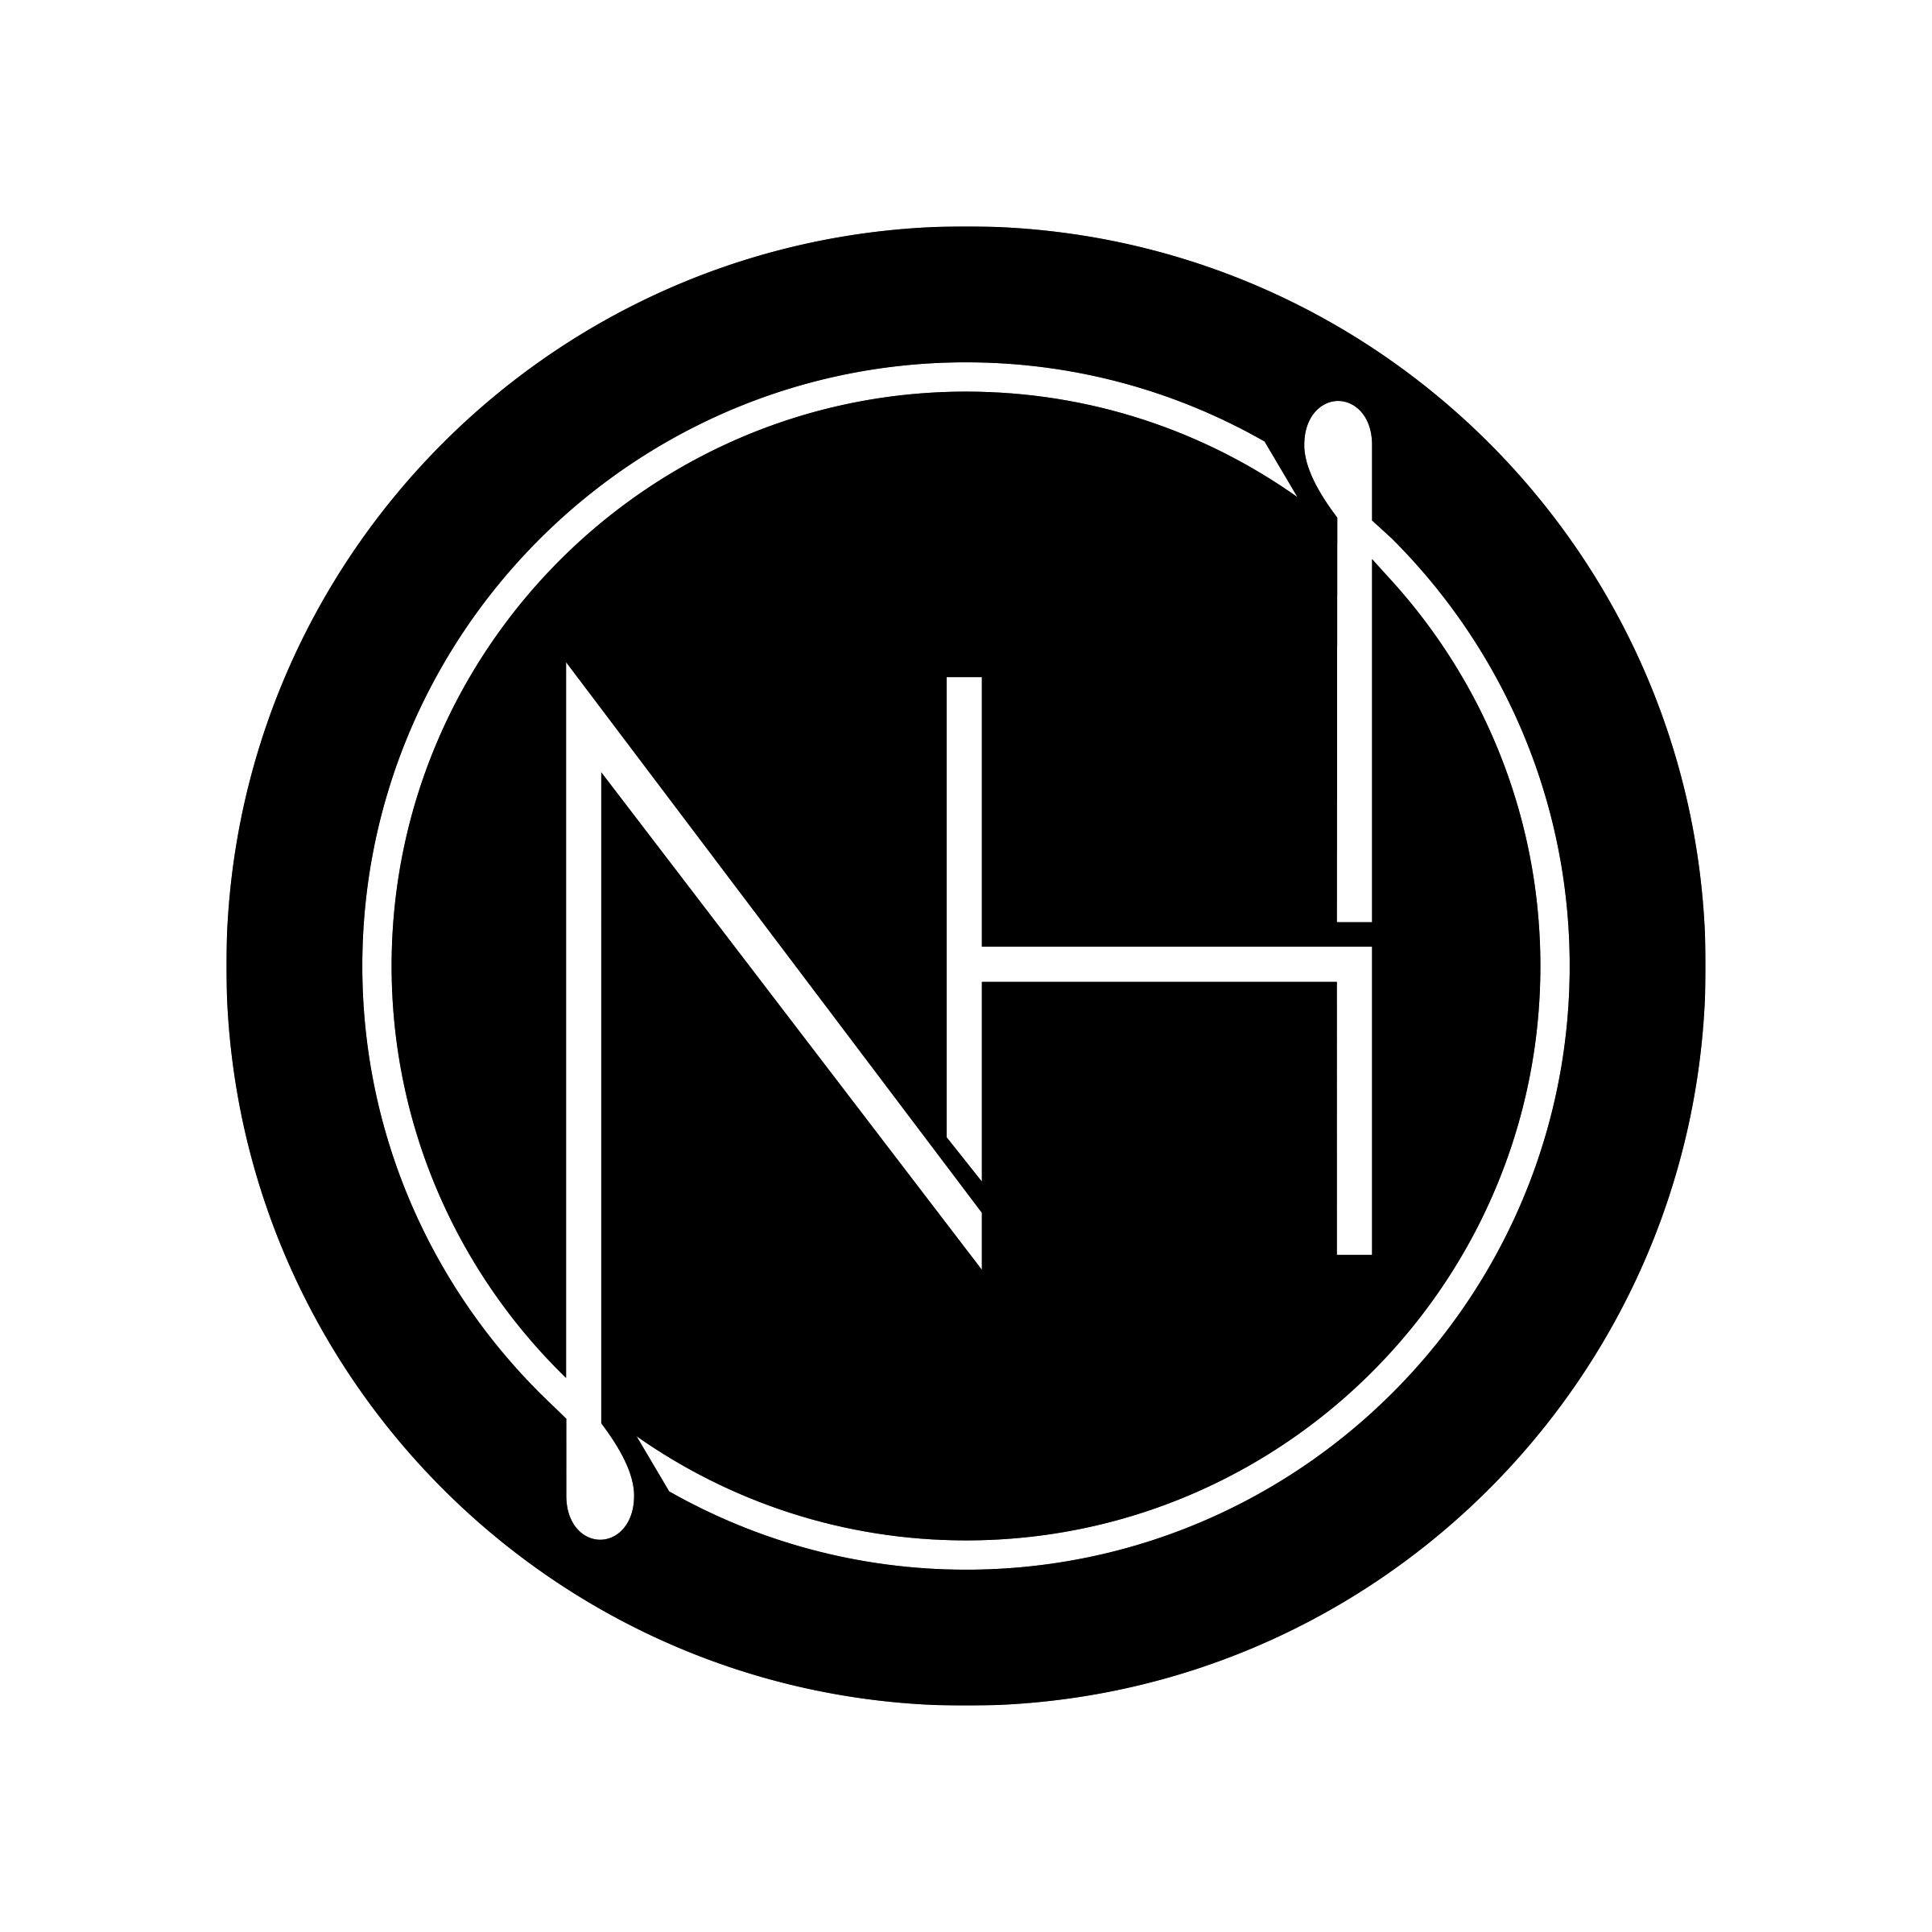 NiallHoran_MonogramCircle_F.jpg